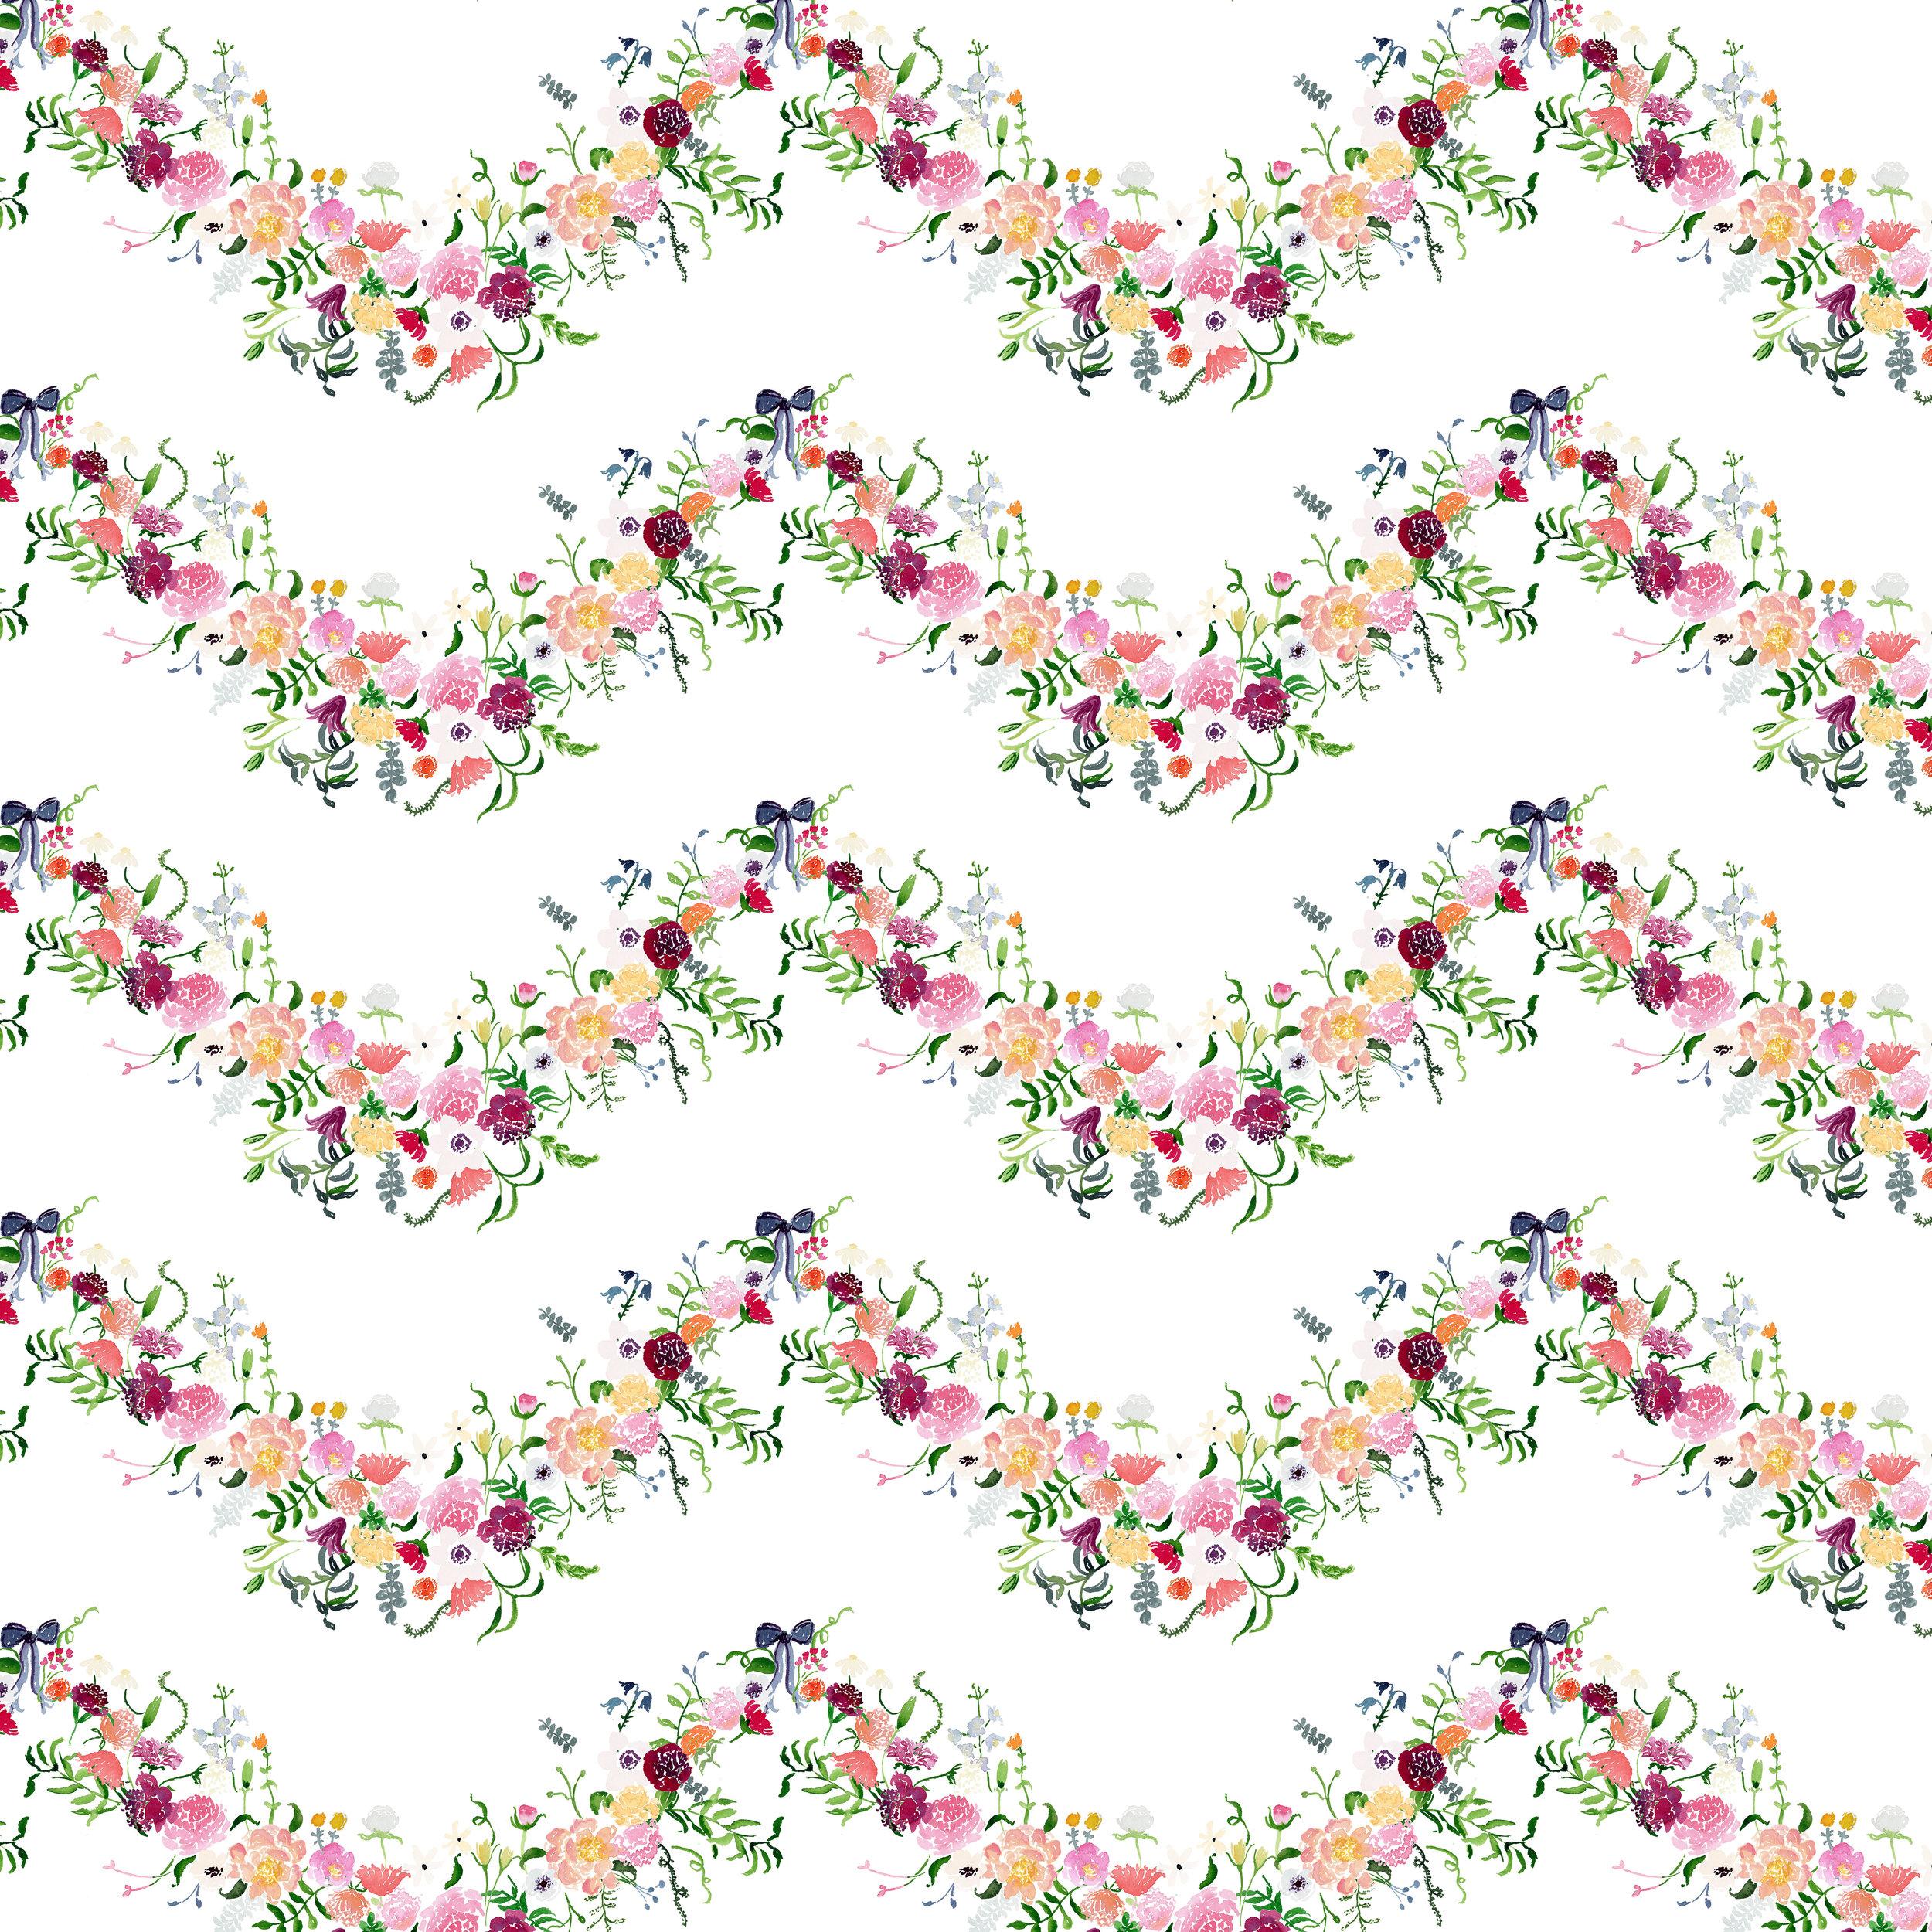 Floral Scallop Pattern Fill_150.jpg